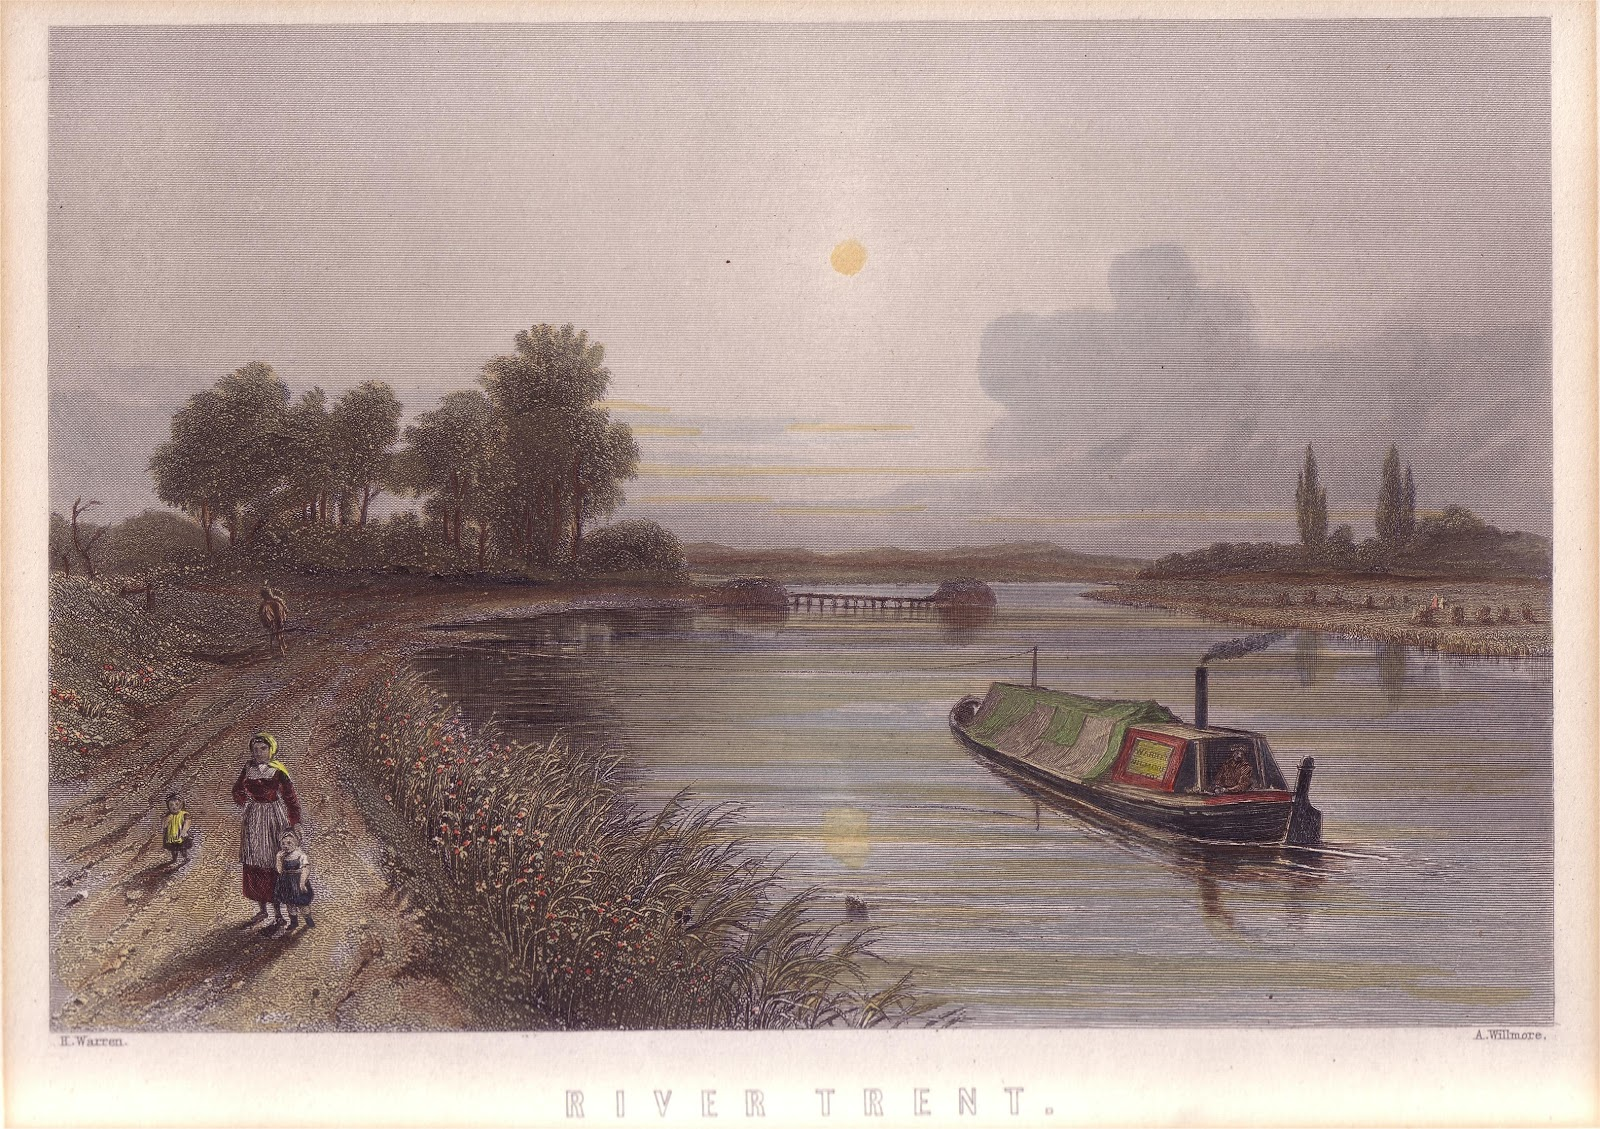 Barge on Trent near Wychnor